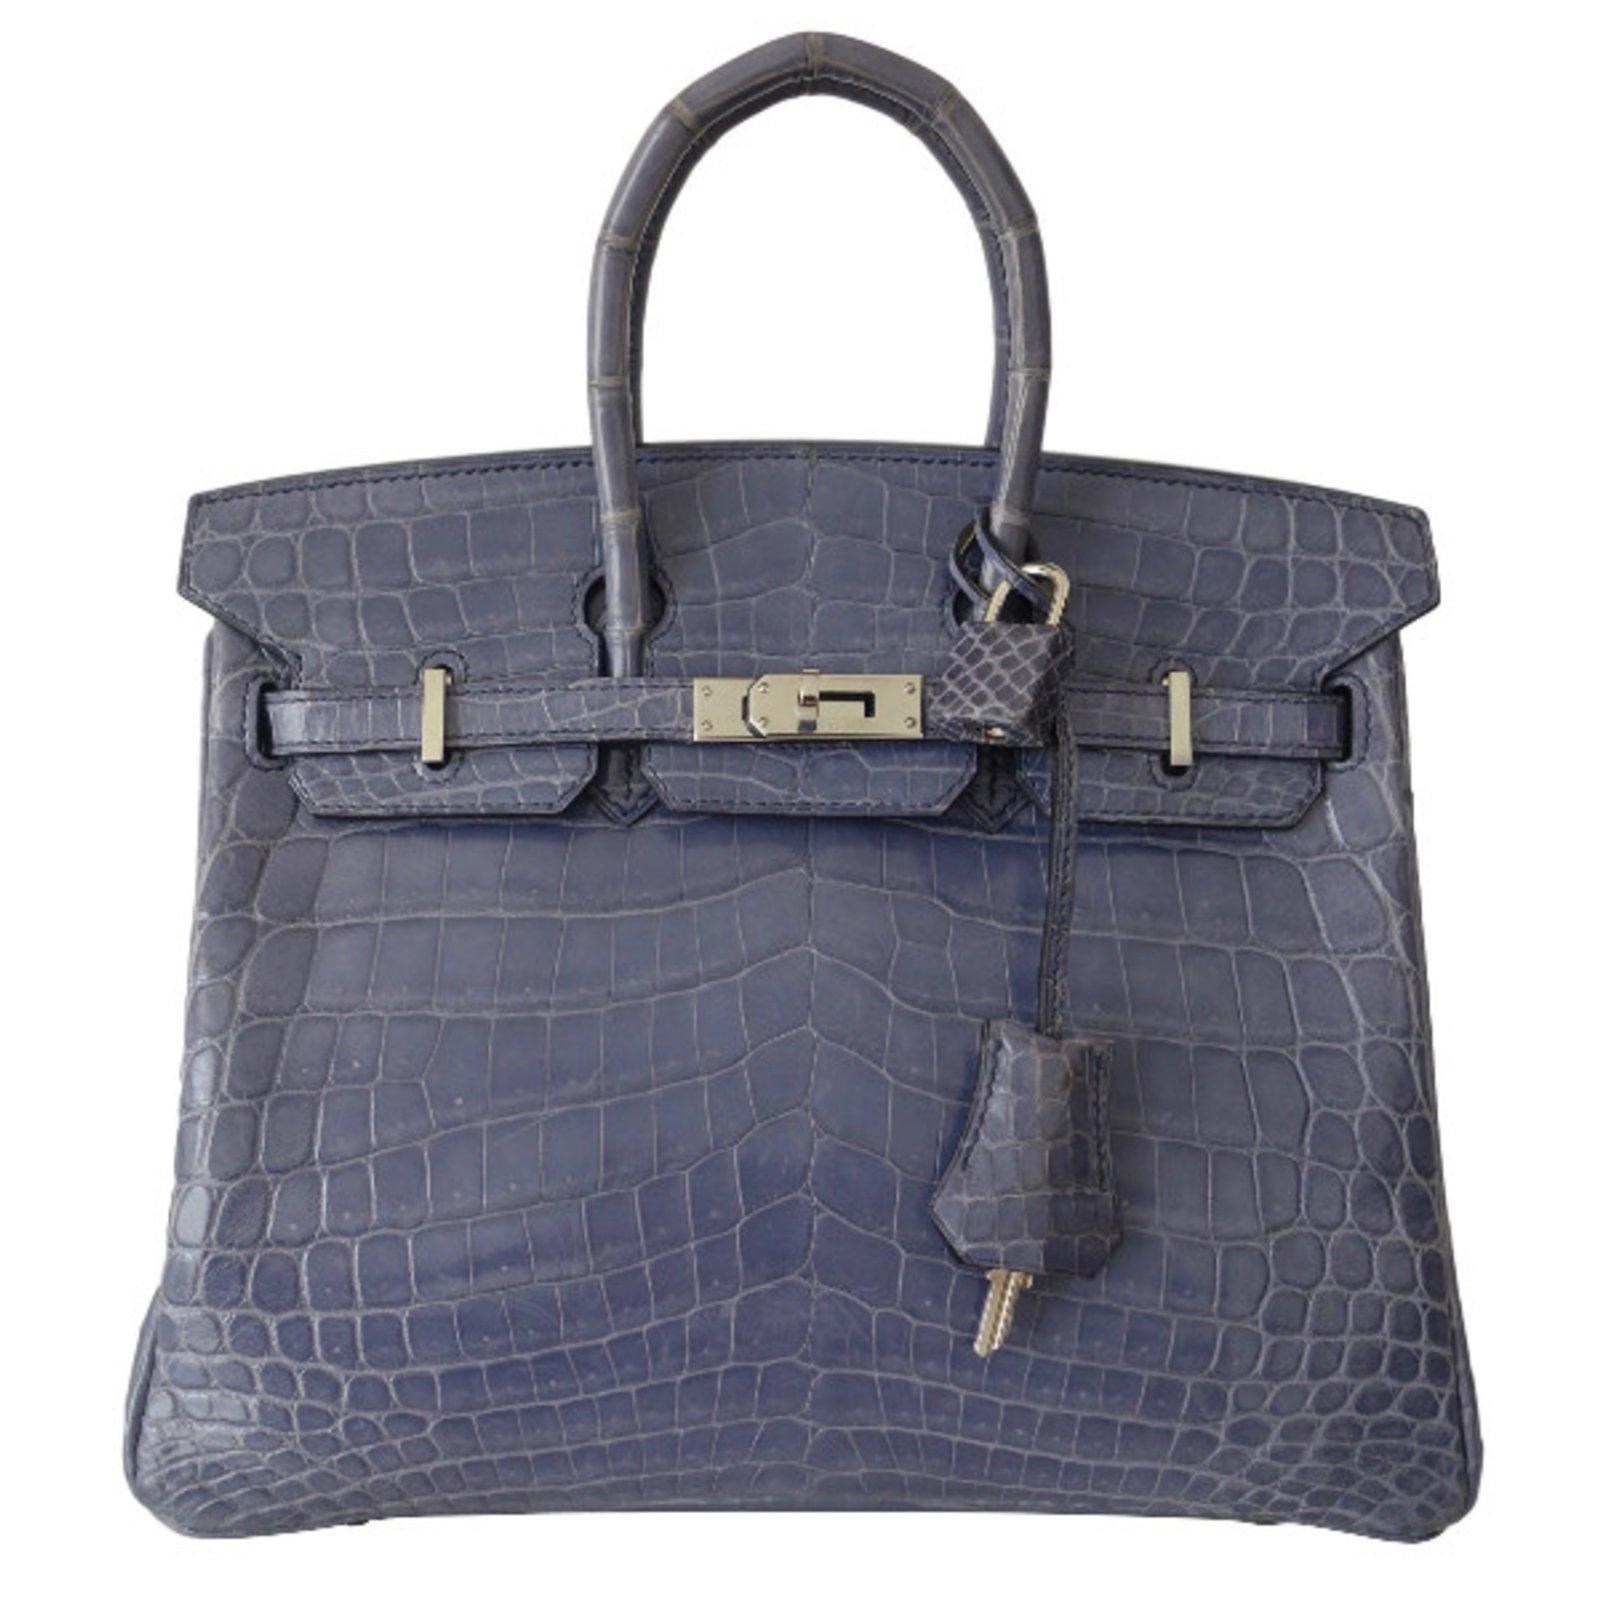 32a2e57990f4 Sacs à main Hermès SAC HERMES BIRKIN CROCODILE 25 Cuirs exotiques  Bleu,Violet ref.